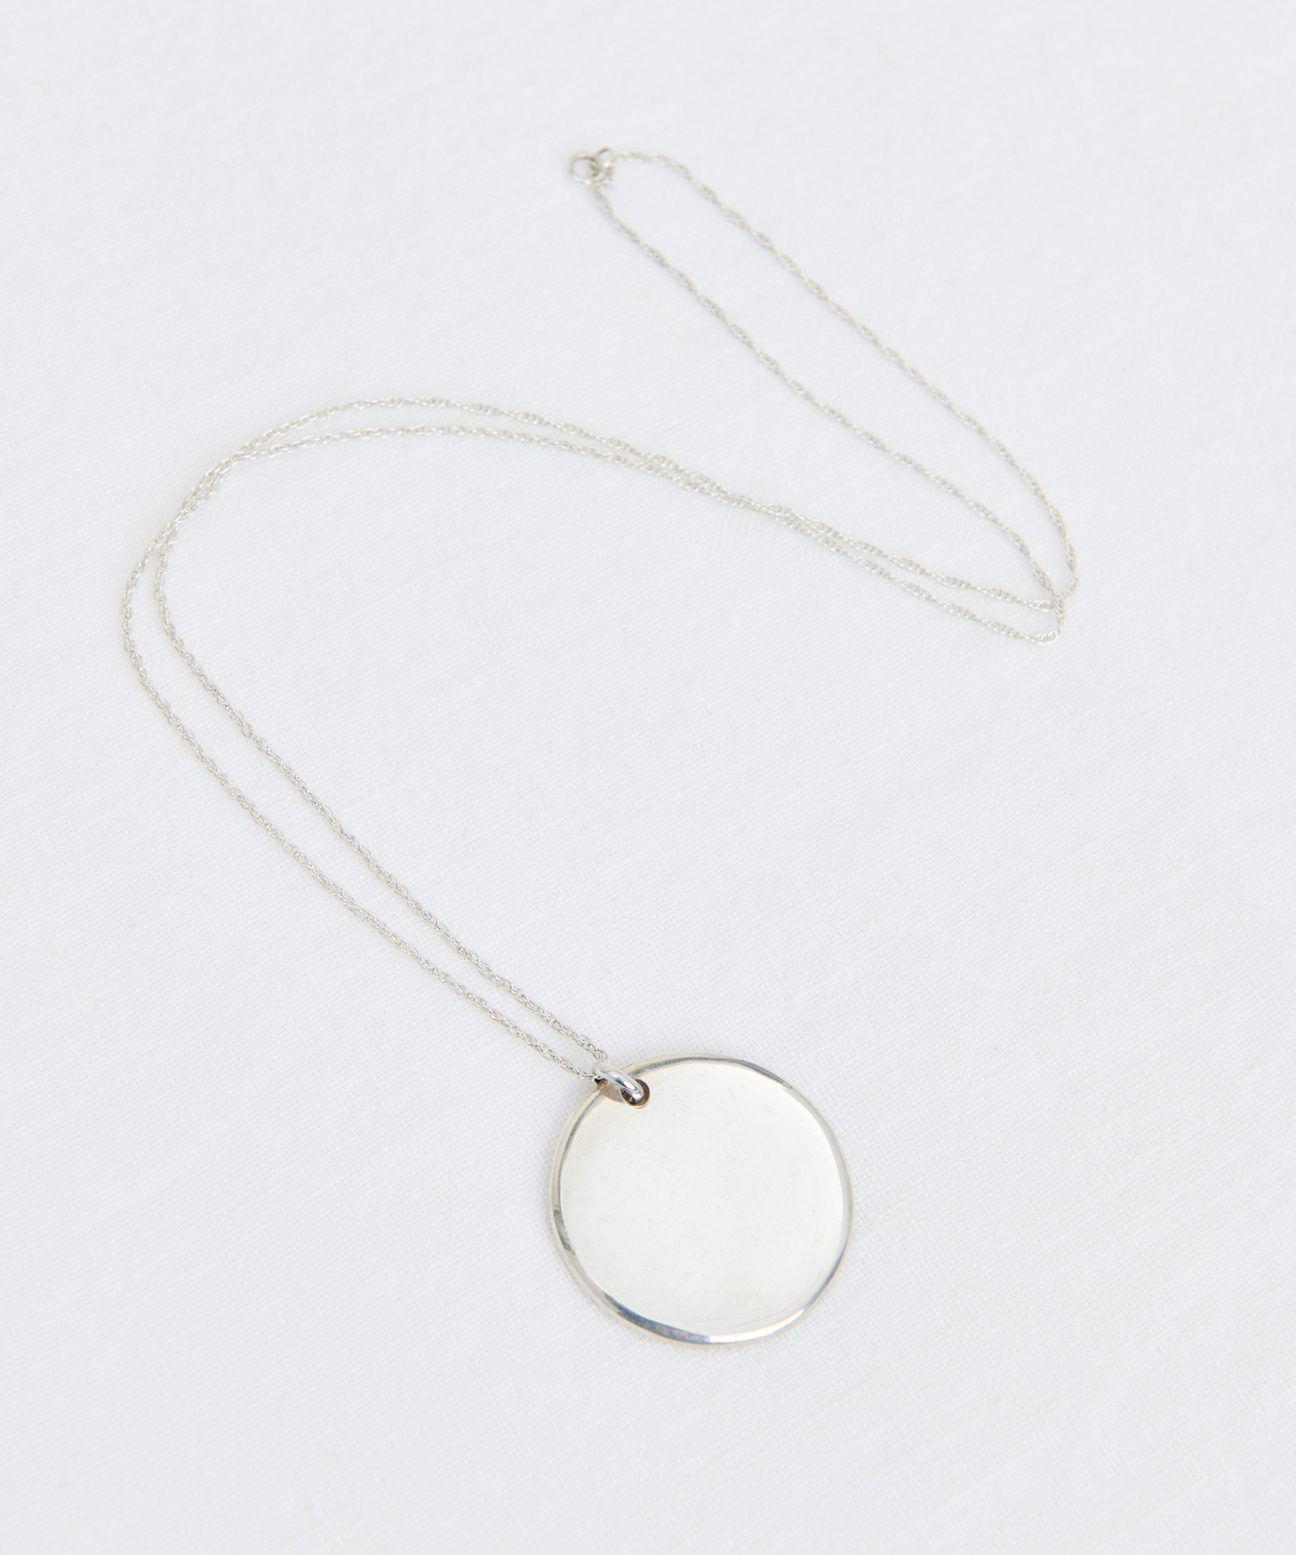 Large Simple Circle Pendant Silver Circle Pendant Necklace